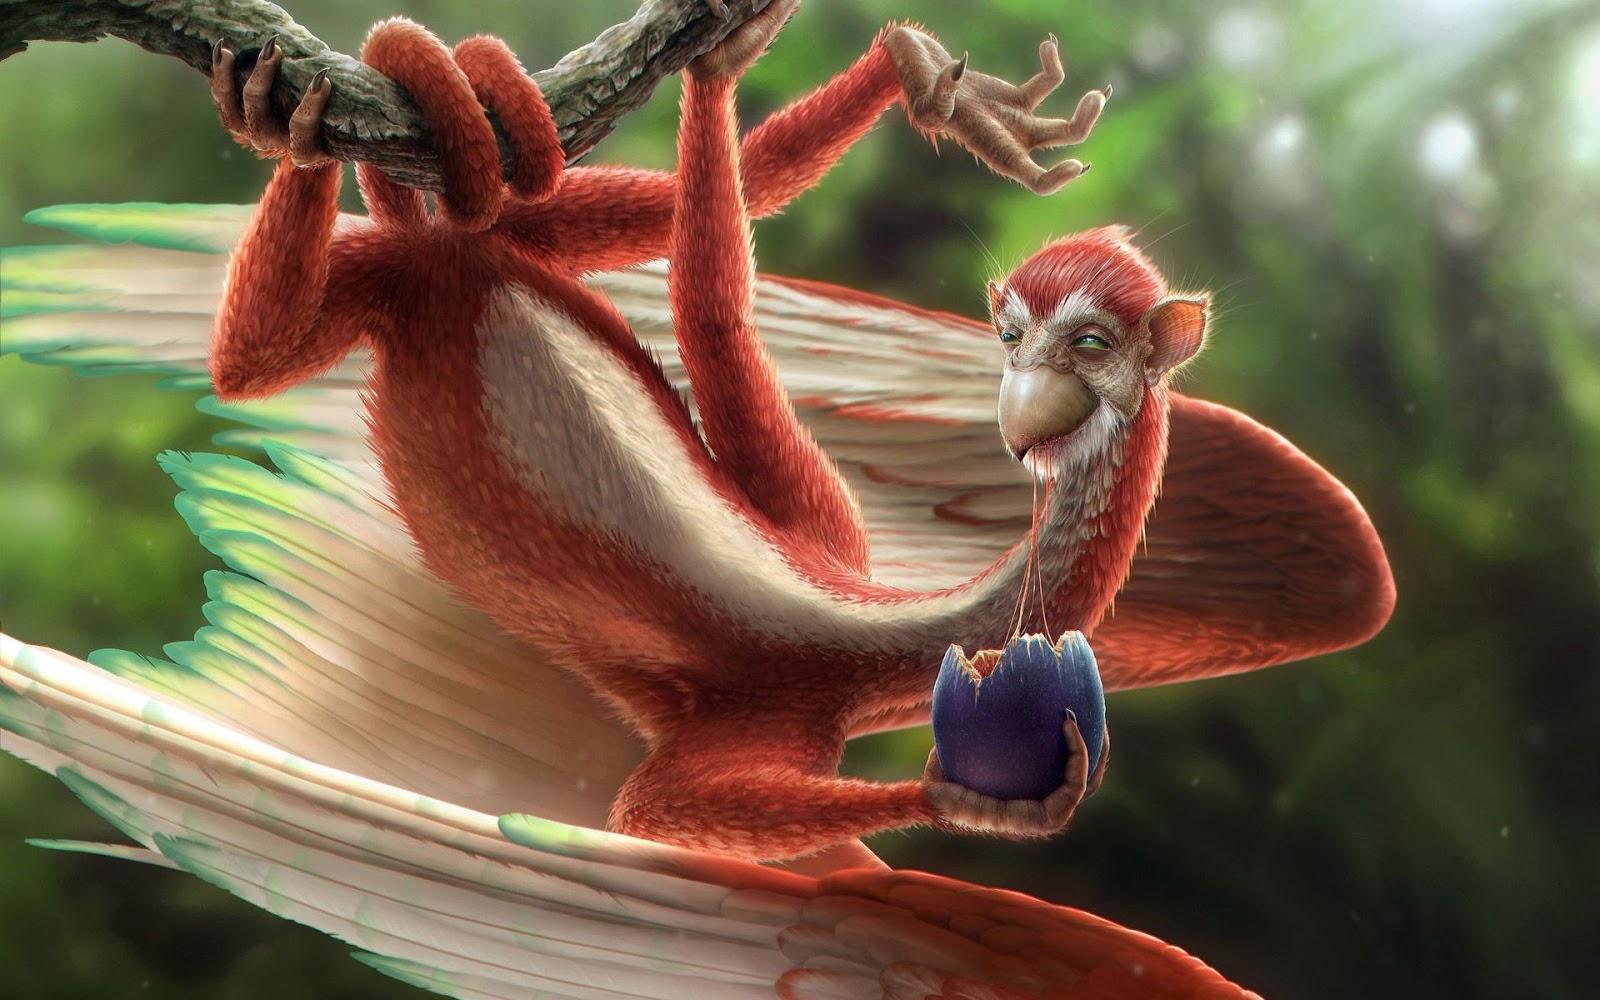 http://2.bp.blogspot.com/--HBqYpStplg/UIUyF7BZn0I/AAAAAAAAD5A/yPdOqLdIguI/s1600/flying-monkey-full-hd-animal-wallpaper.jpg